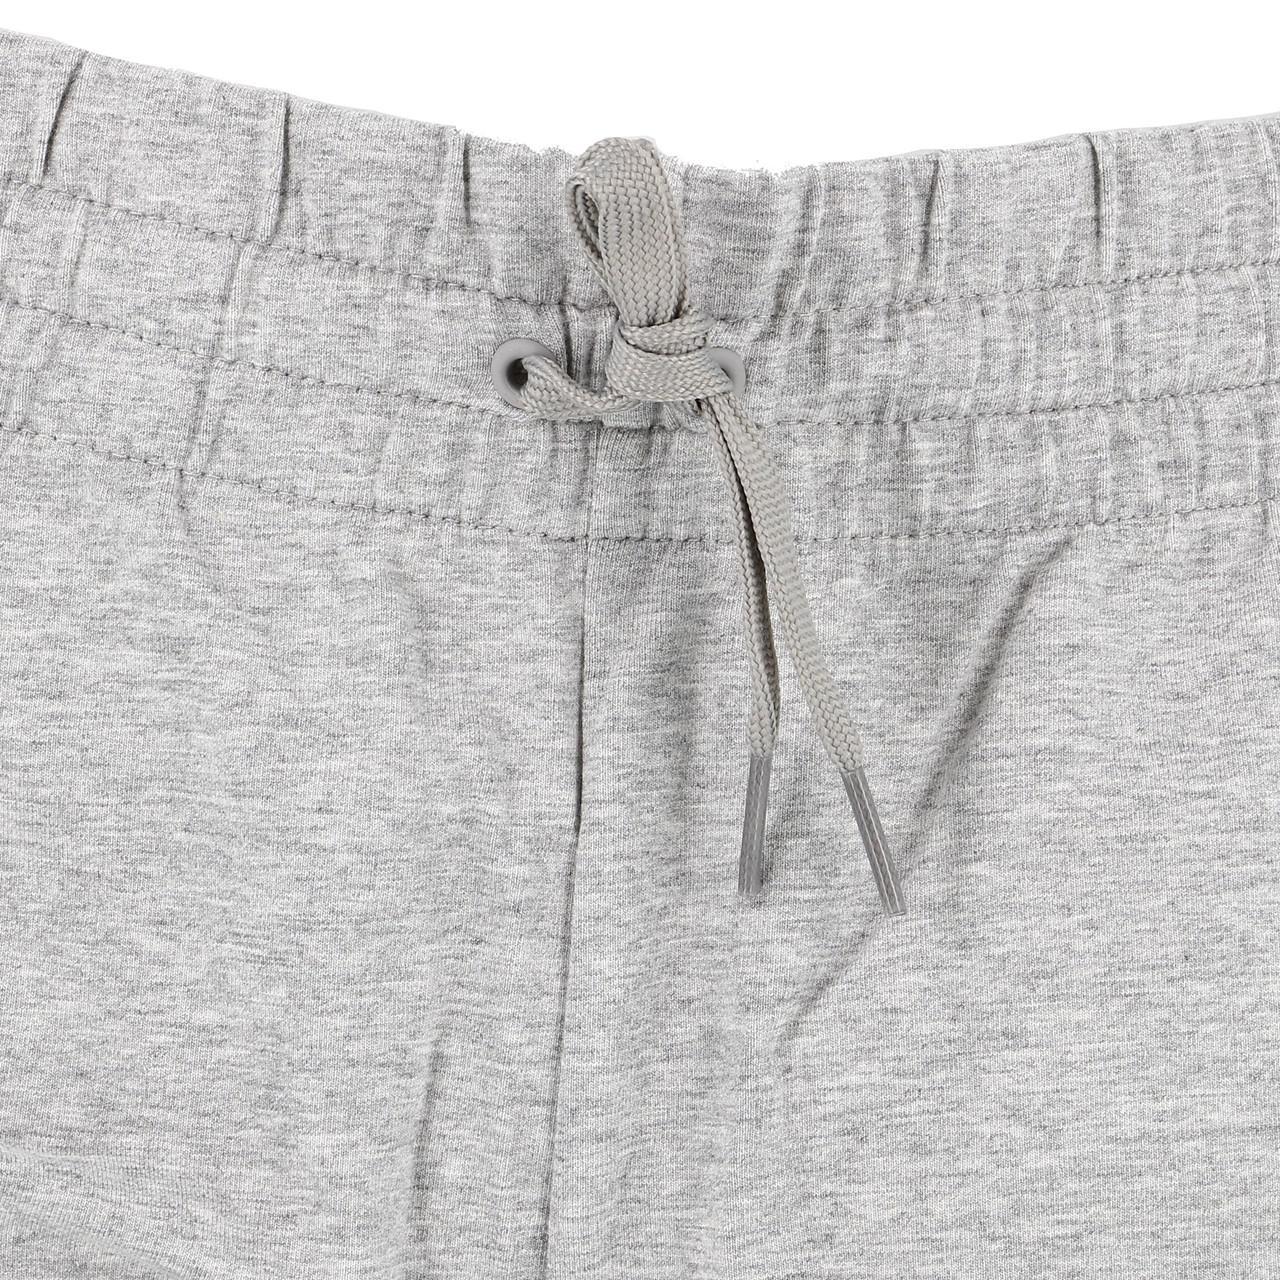 Shorts-Bermuda-Adidas-E-Aop-Grau-Ch-Shorts-L-Grau-18259-Neu Indexbild 4